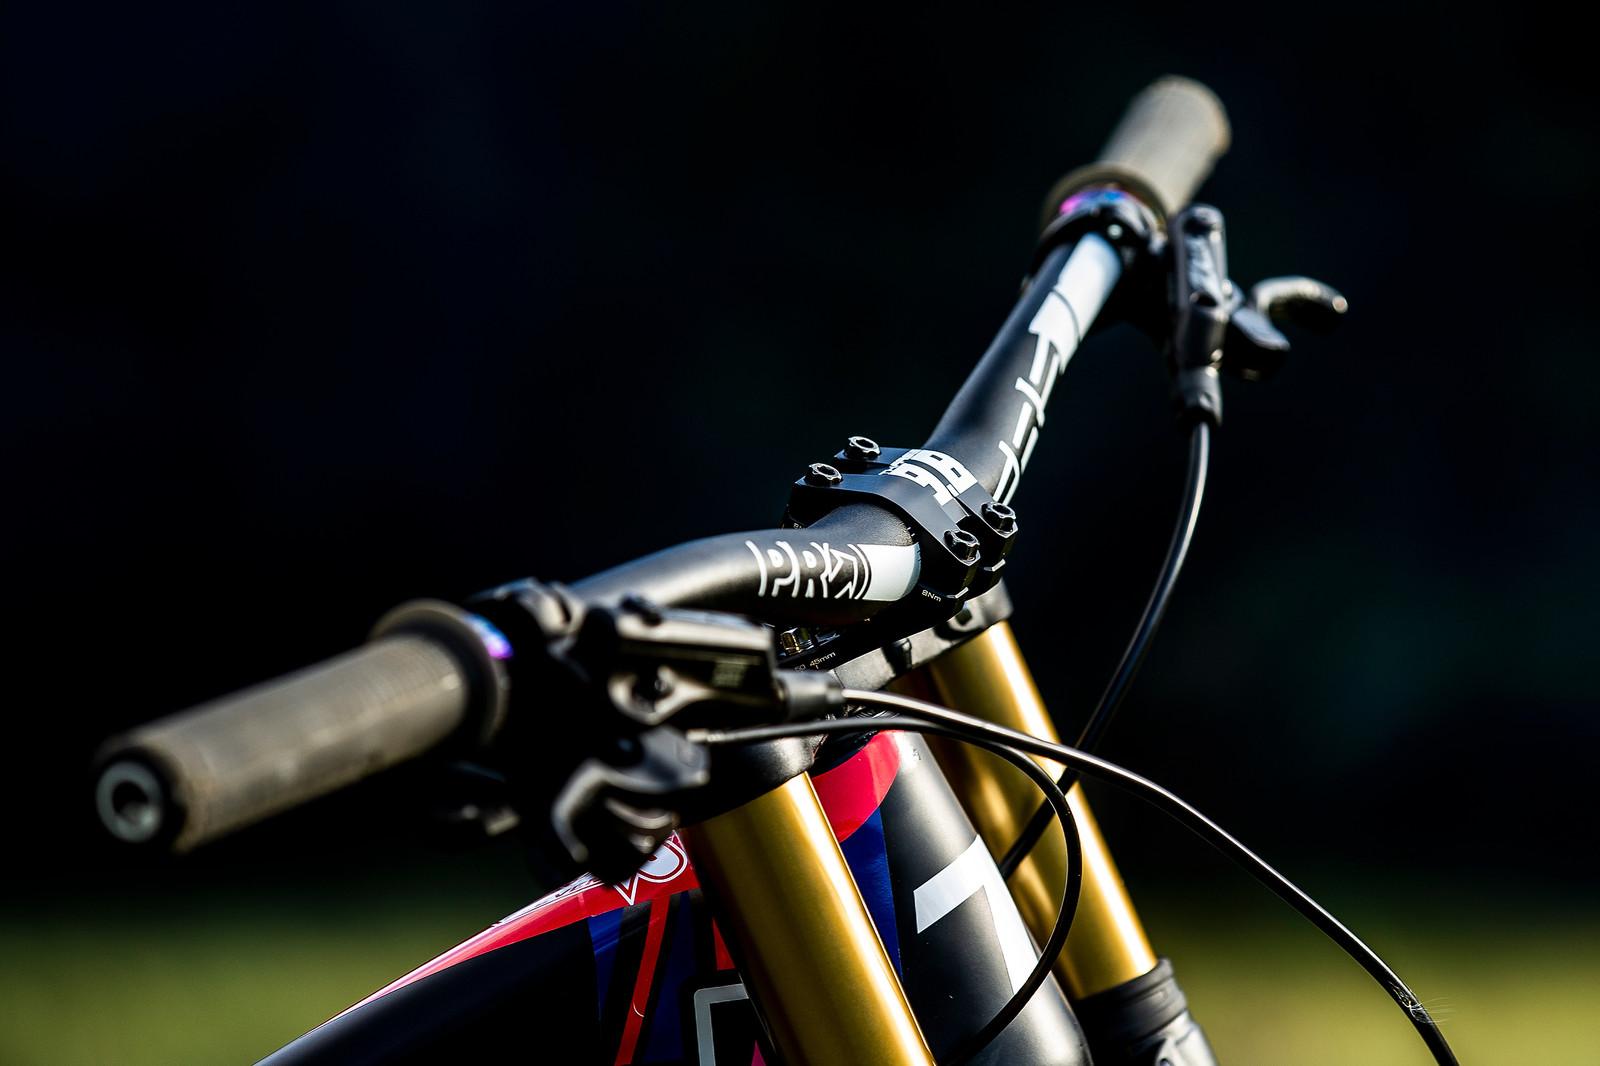 Cockpit - WORLD CHAMPS BIKE - Jamie Edmondson's Transition TR11 - Mountain Biking Pictures - Vital MTB